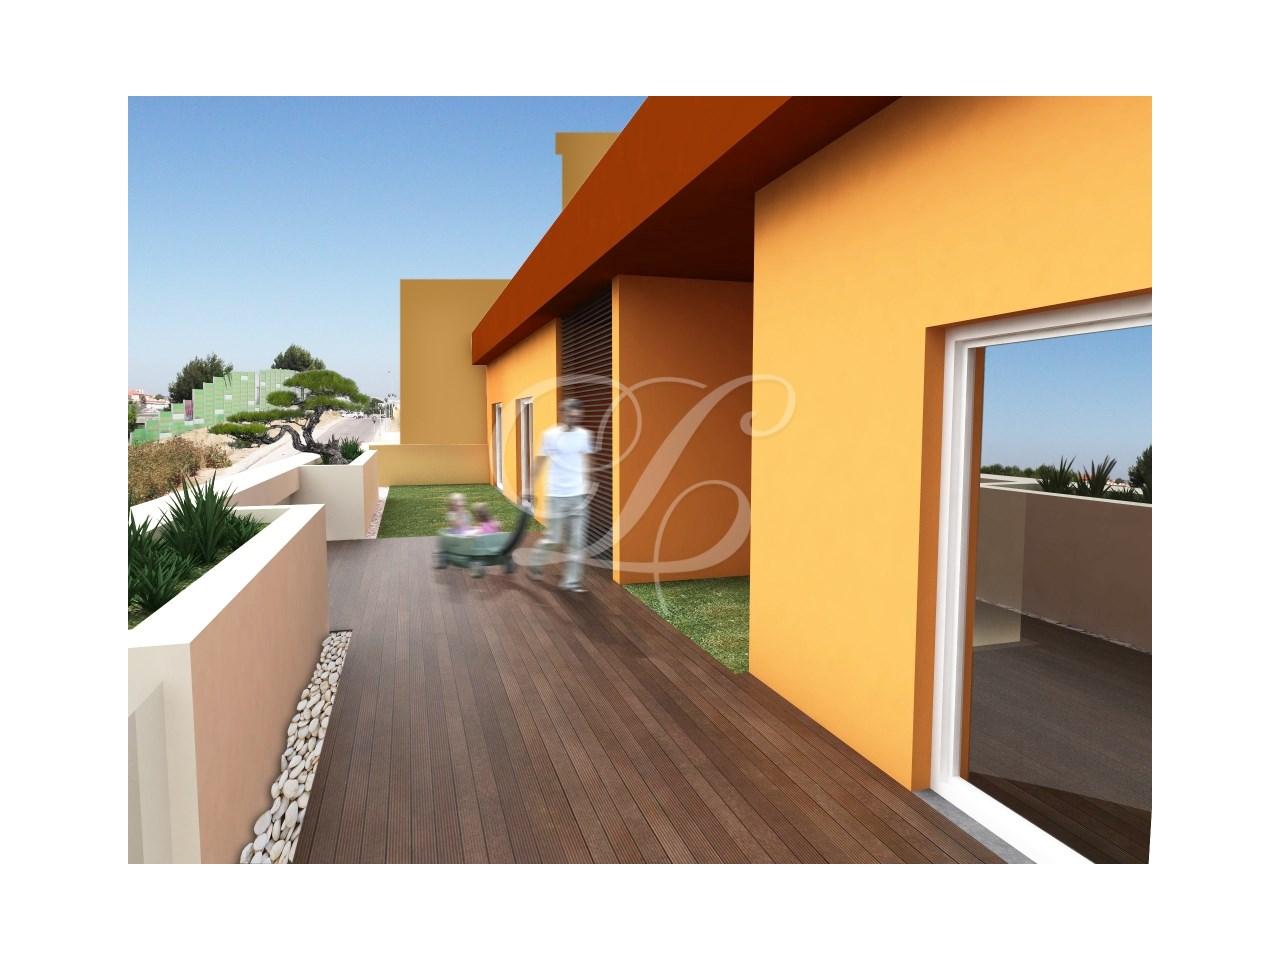 Appartement T5, NOVO, PENTHOUSE, avec terrasse, jacuzzi, jardin, barbe